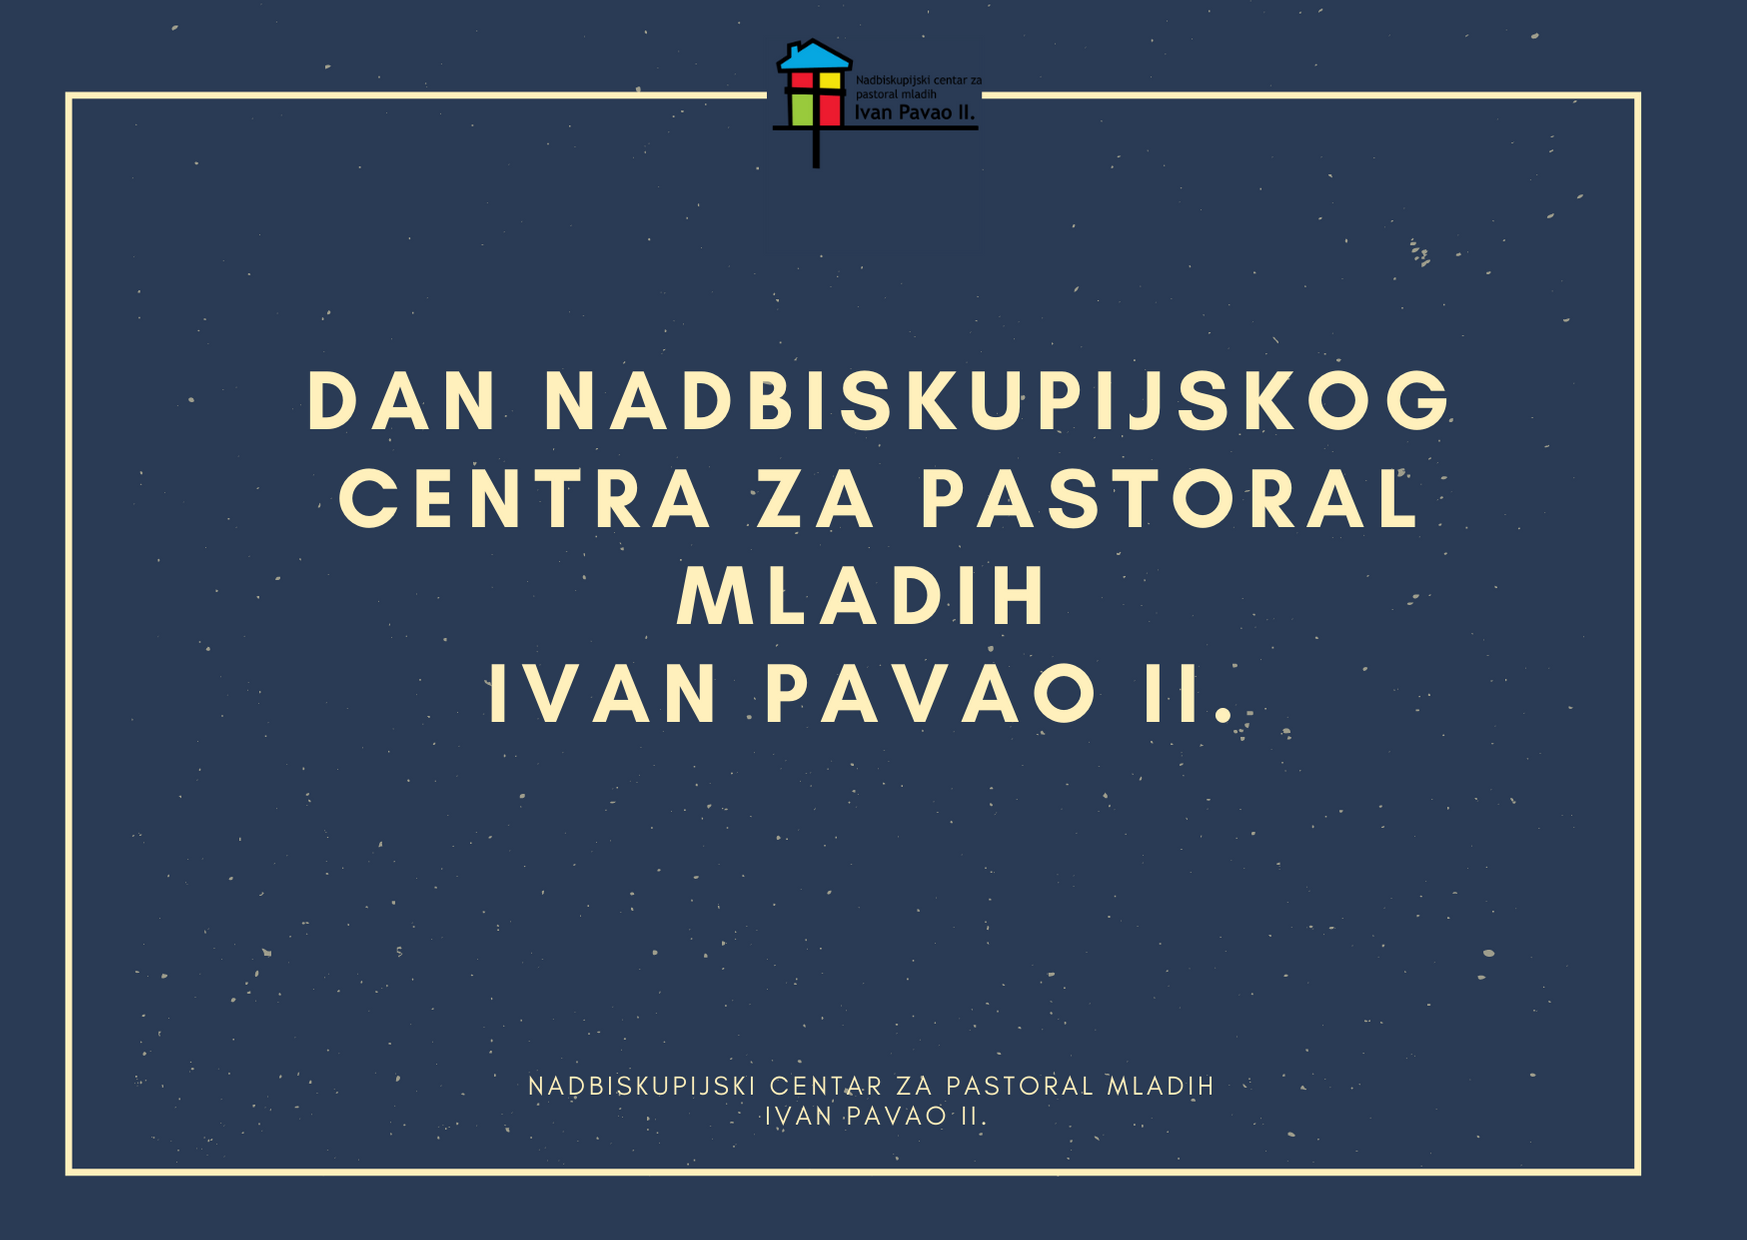 Dan Nadbiskupijskog centra za pastoral mladih Ivan Pavao II.